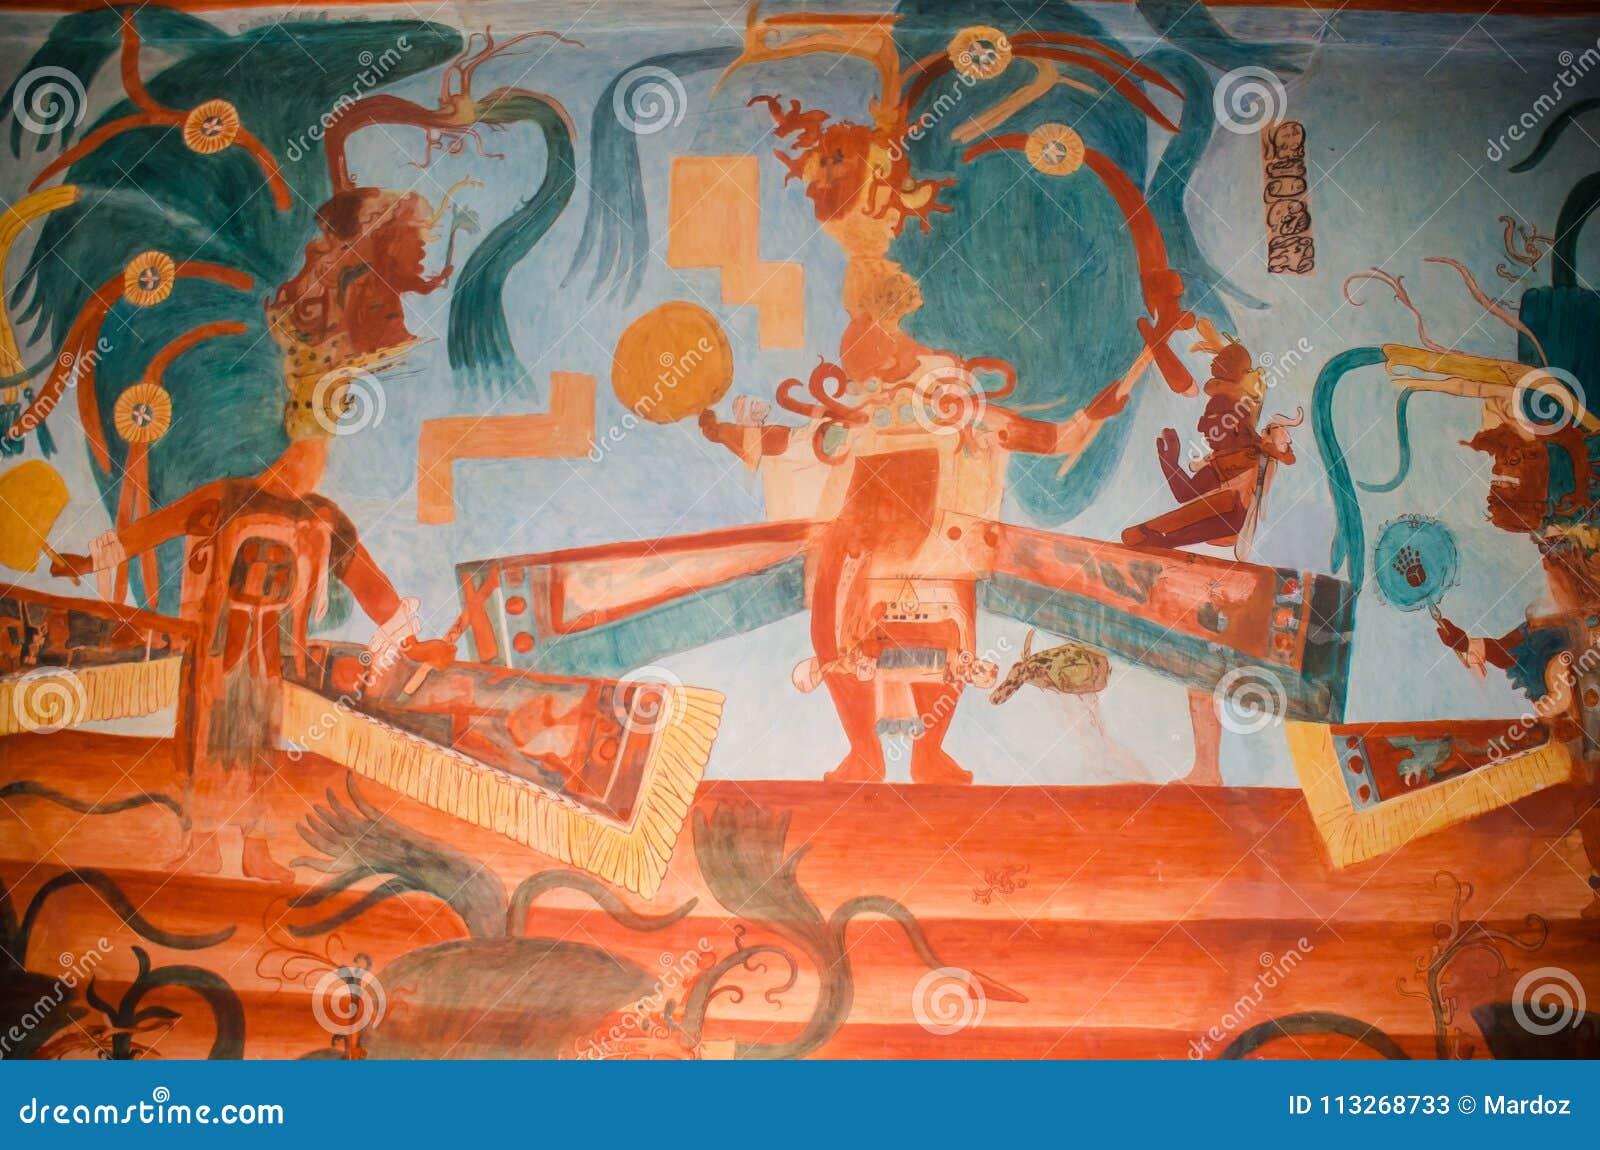 Pinturas Murales De Bonampak Que Describen Nobleza Imagen De Archivo